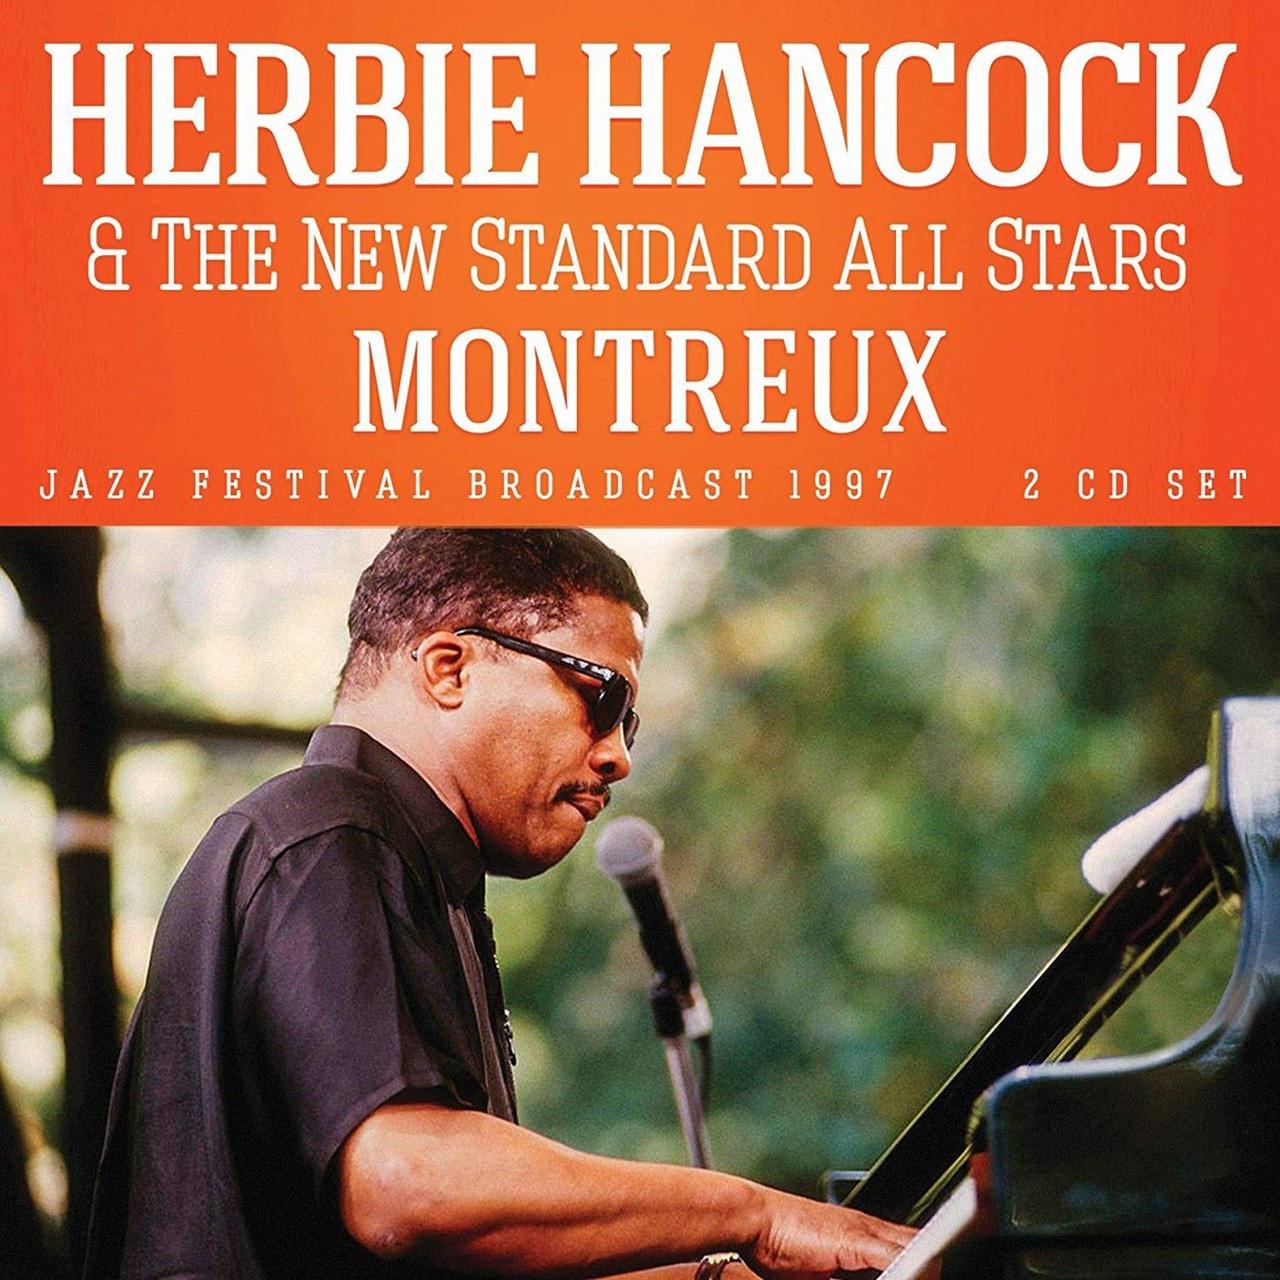 Montreux: Jazz Festival Broadcast 1997 - 1